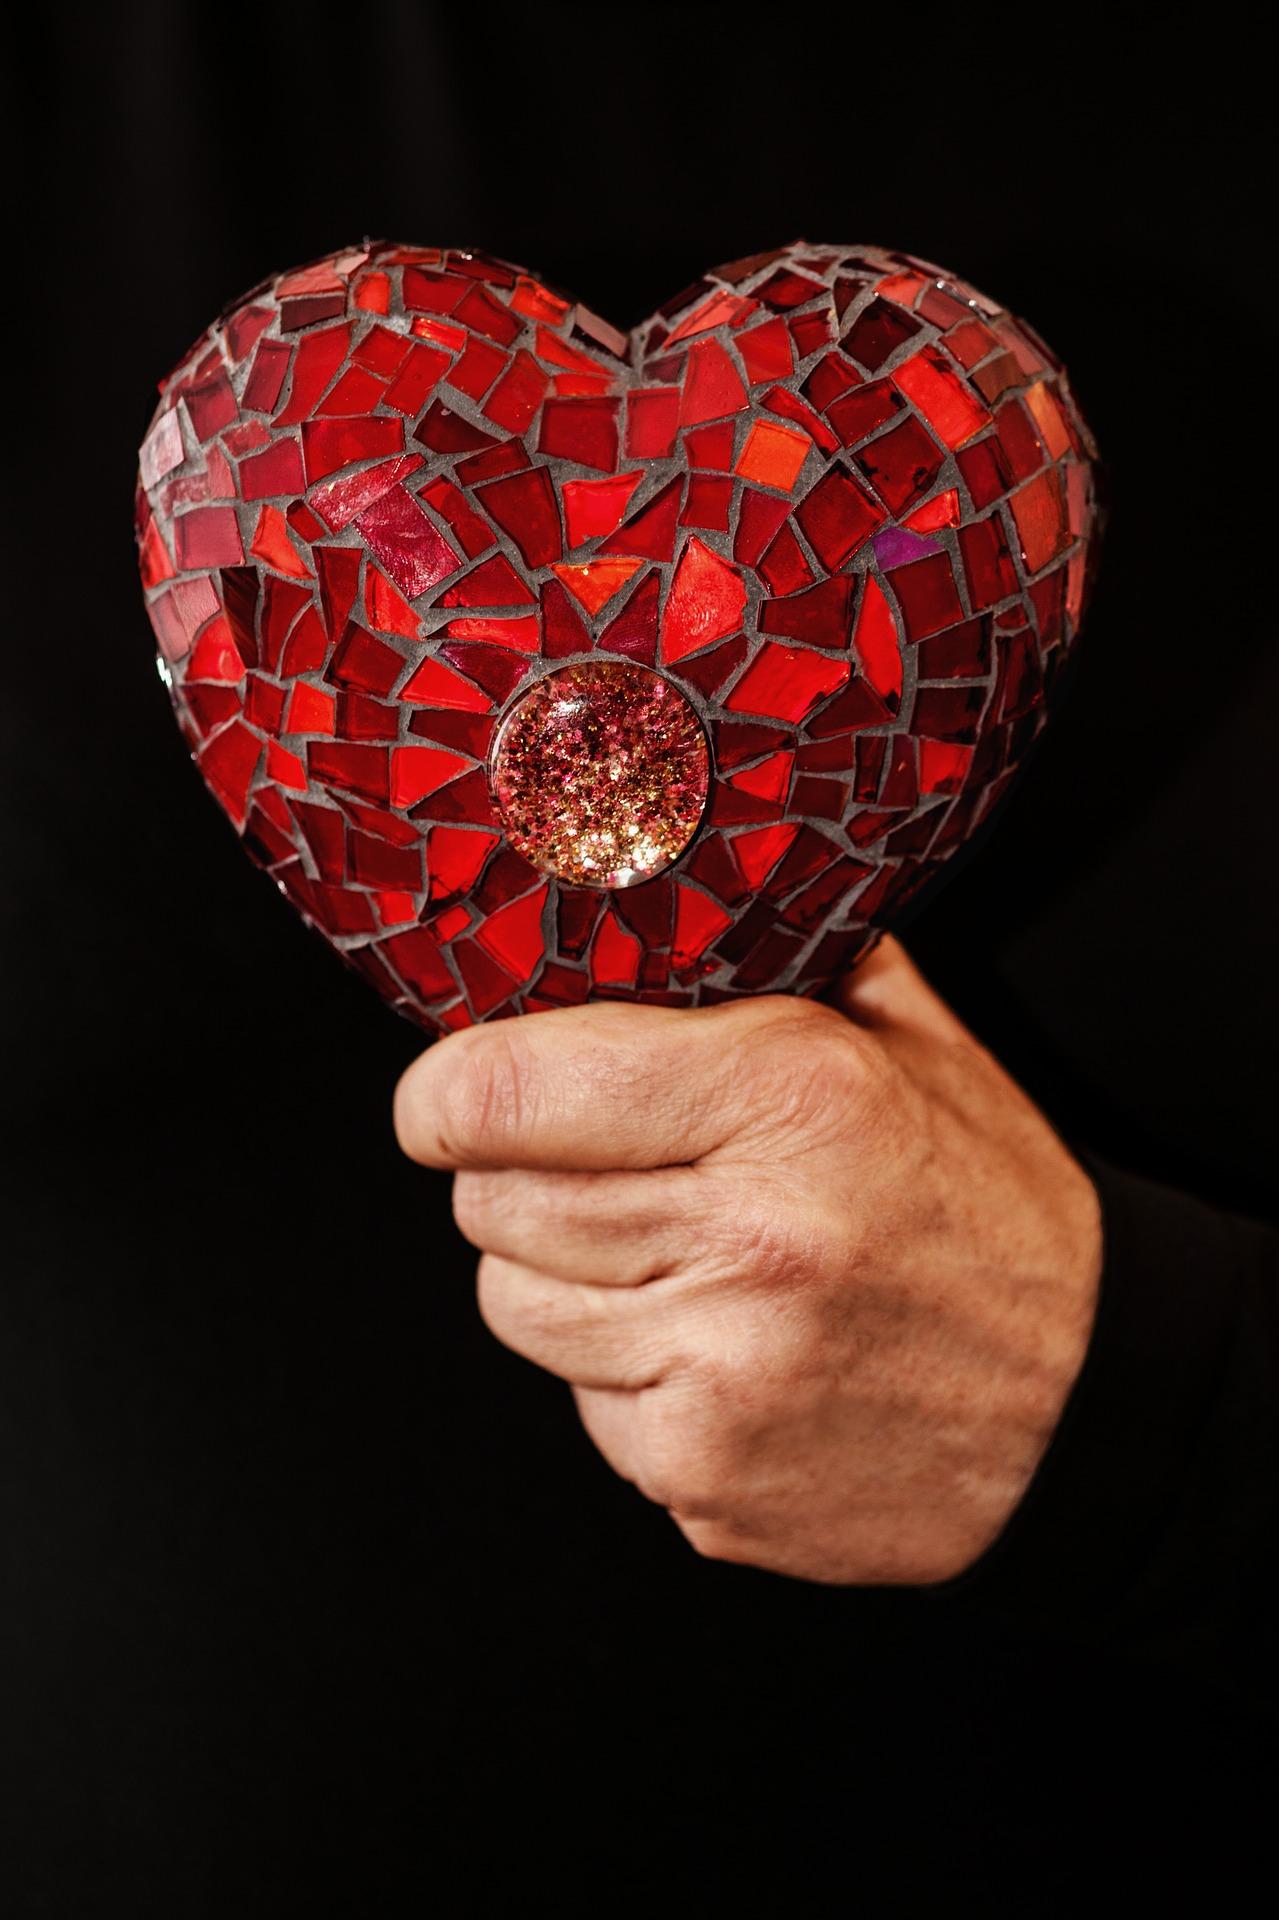 heart-2206480_1920